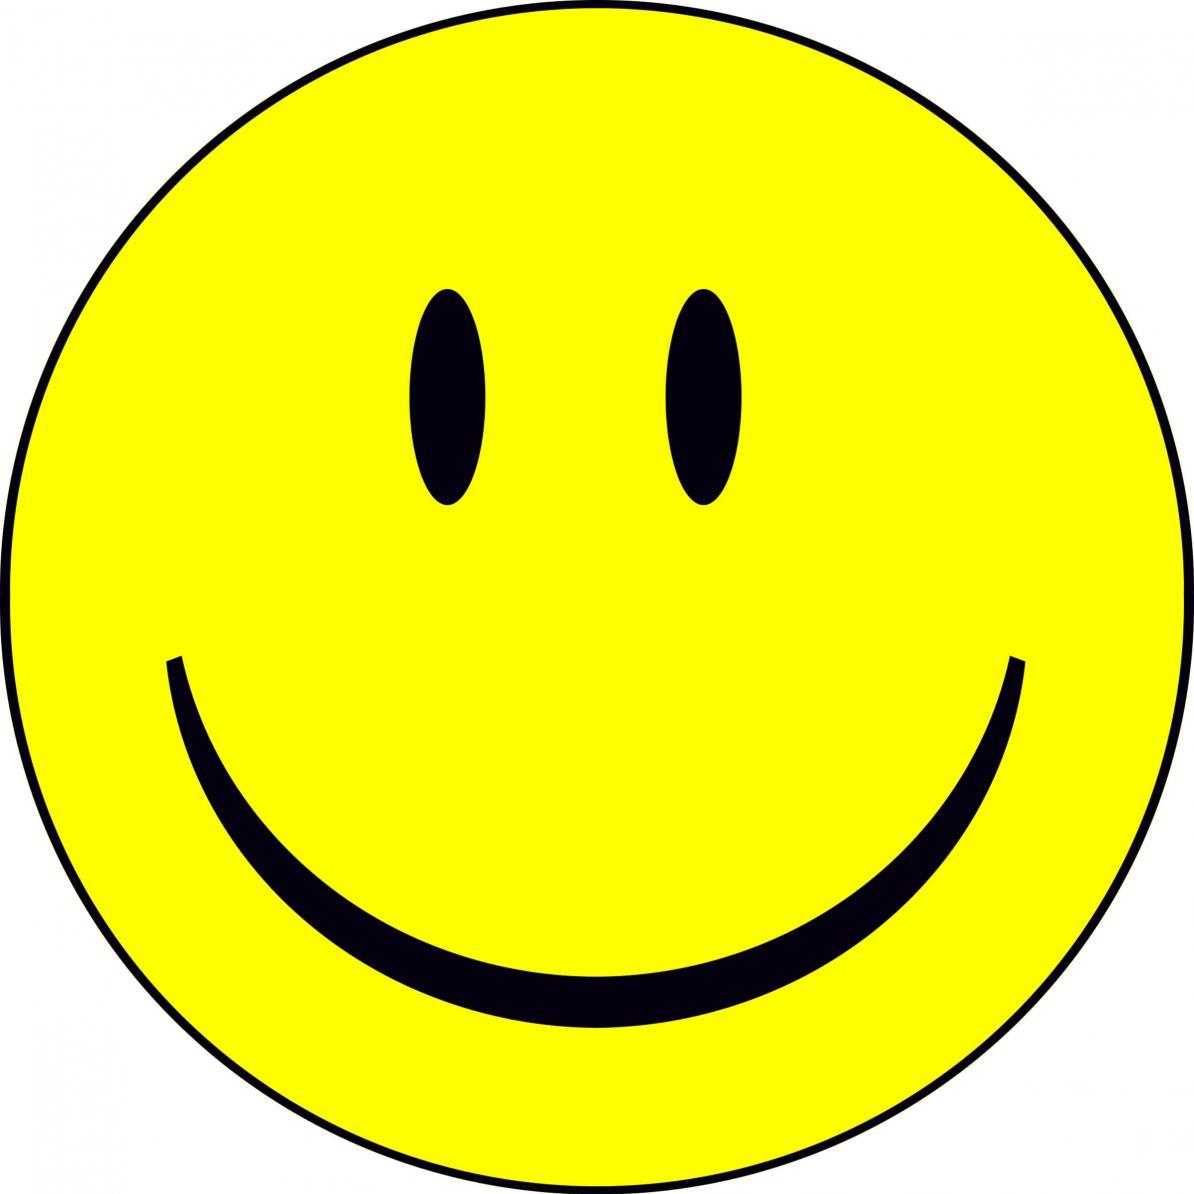 1194x1194 Smiley Faces Pictures Clip Art Clipart